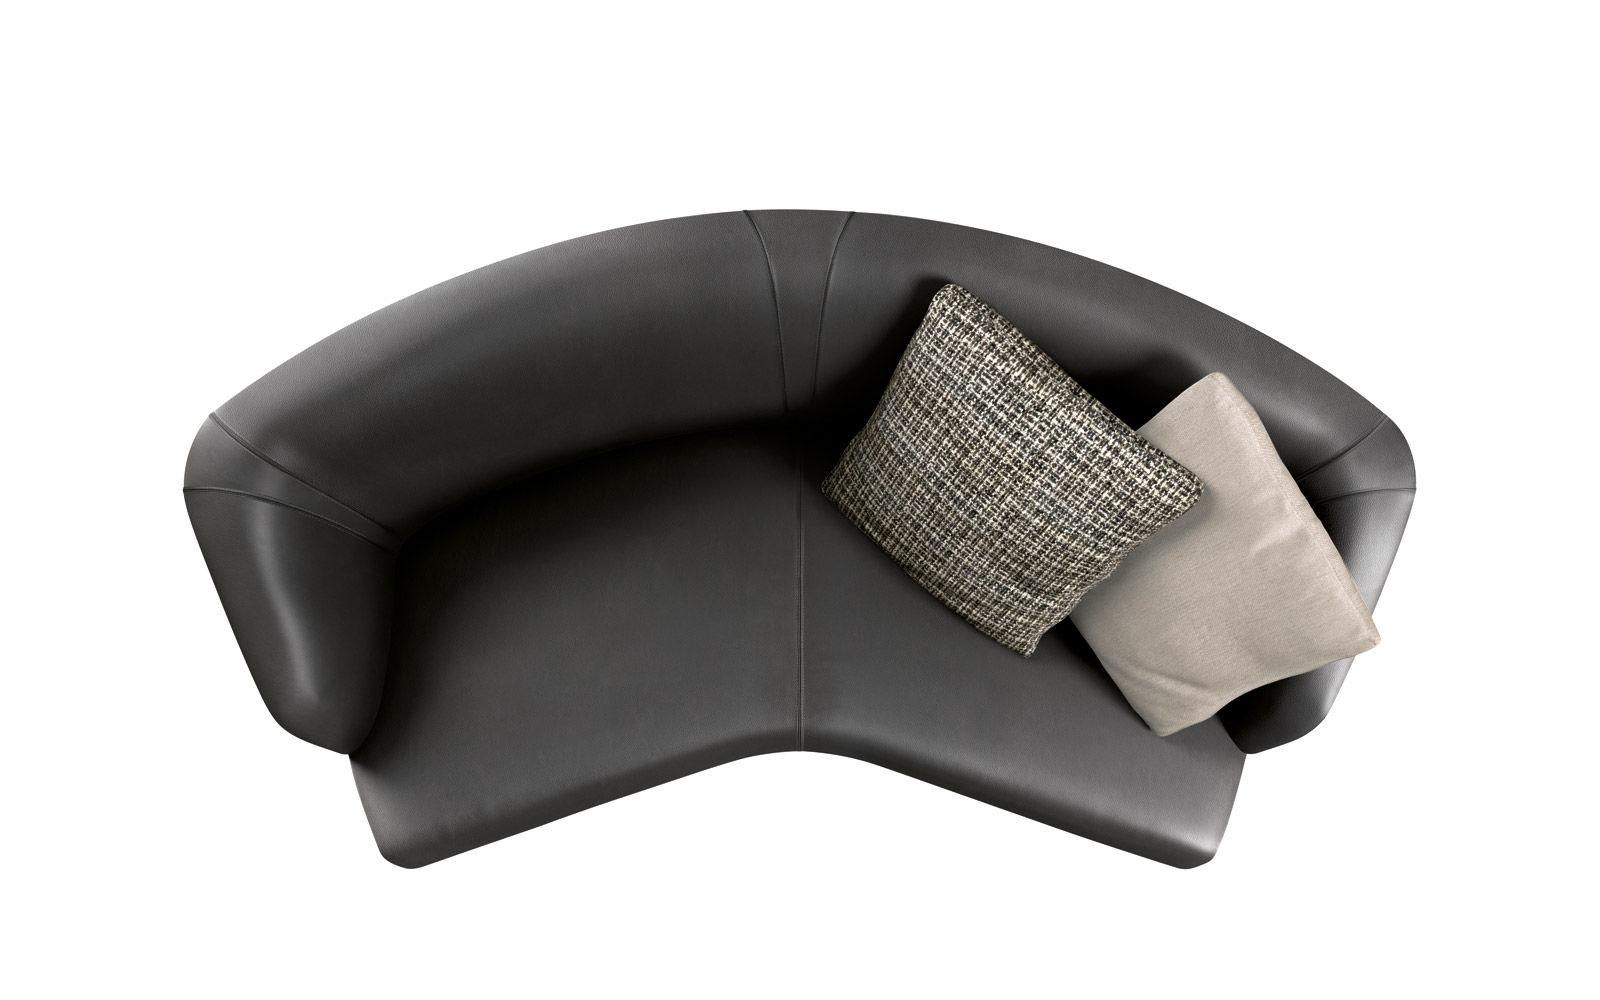 Full Size of Creed Halbrundes Lounge Sofa Sofas De Minotti Copperfield 3 Sitzer Mit Relaxfunktion Muuto Rundes Chesterfield Gebraucht U Form Xxl Kare Abnehmbarer Bezug Sofa Sofa Halbrund